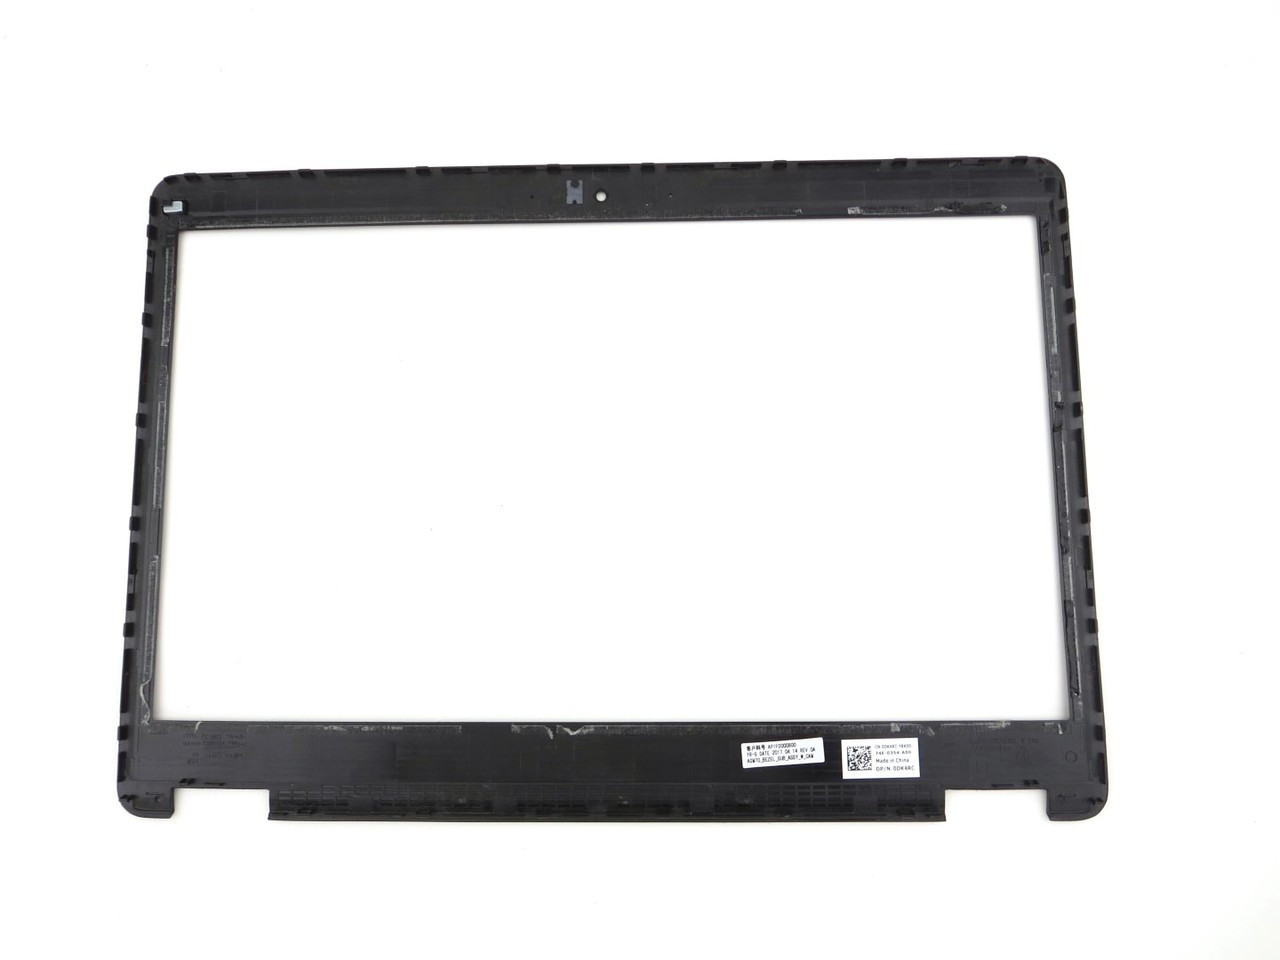 "Dell Latitude E5470 14"" LCD Front Trim Cover Bezel Plastic - With Camera Port - Non Touchscreen - DK4RC 0DK4RC"